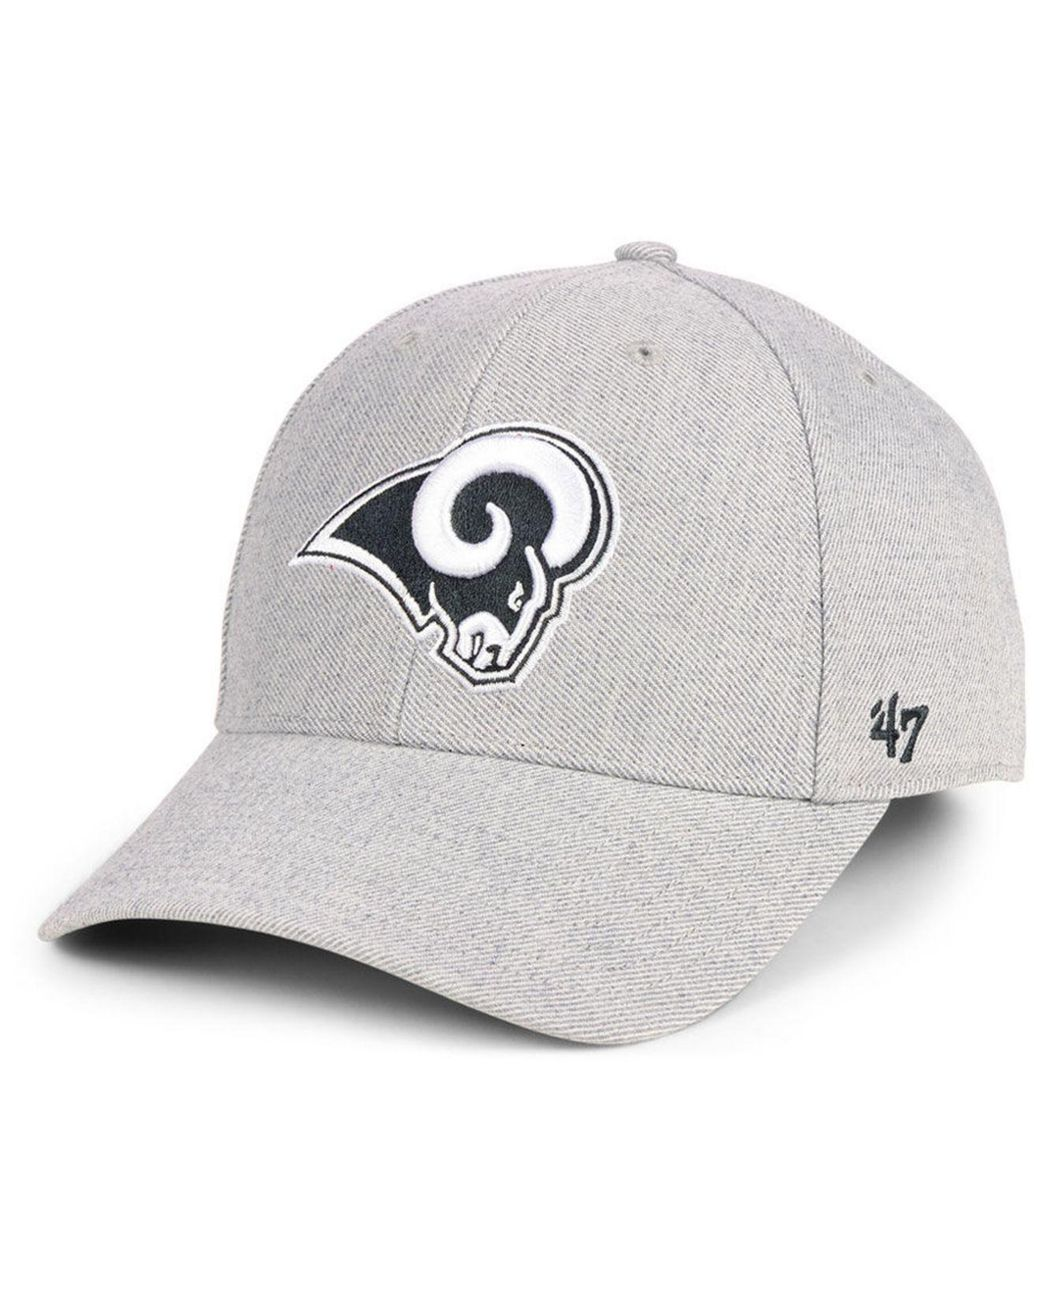 676443d9d05d6 47 Brand. Men s Gray Los Angeles Rams Heathered Black White Mvp Adjustable  Cap